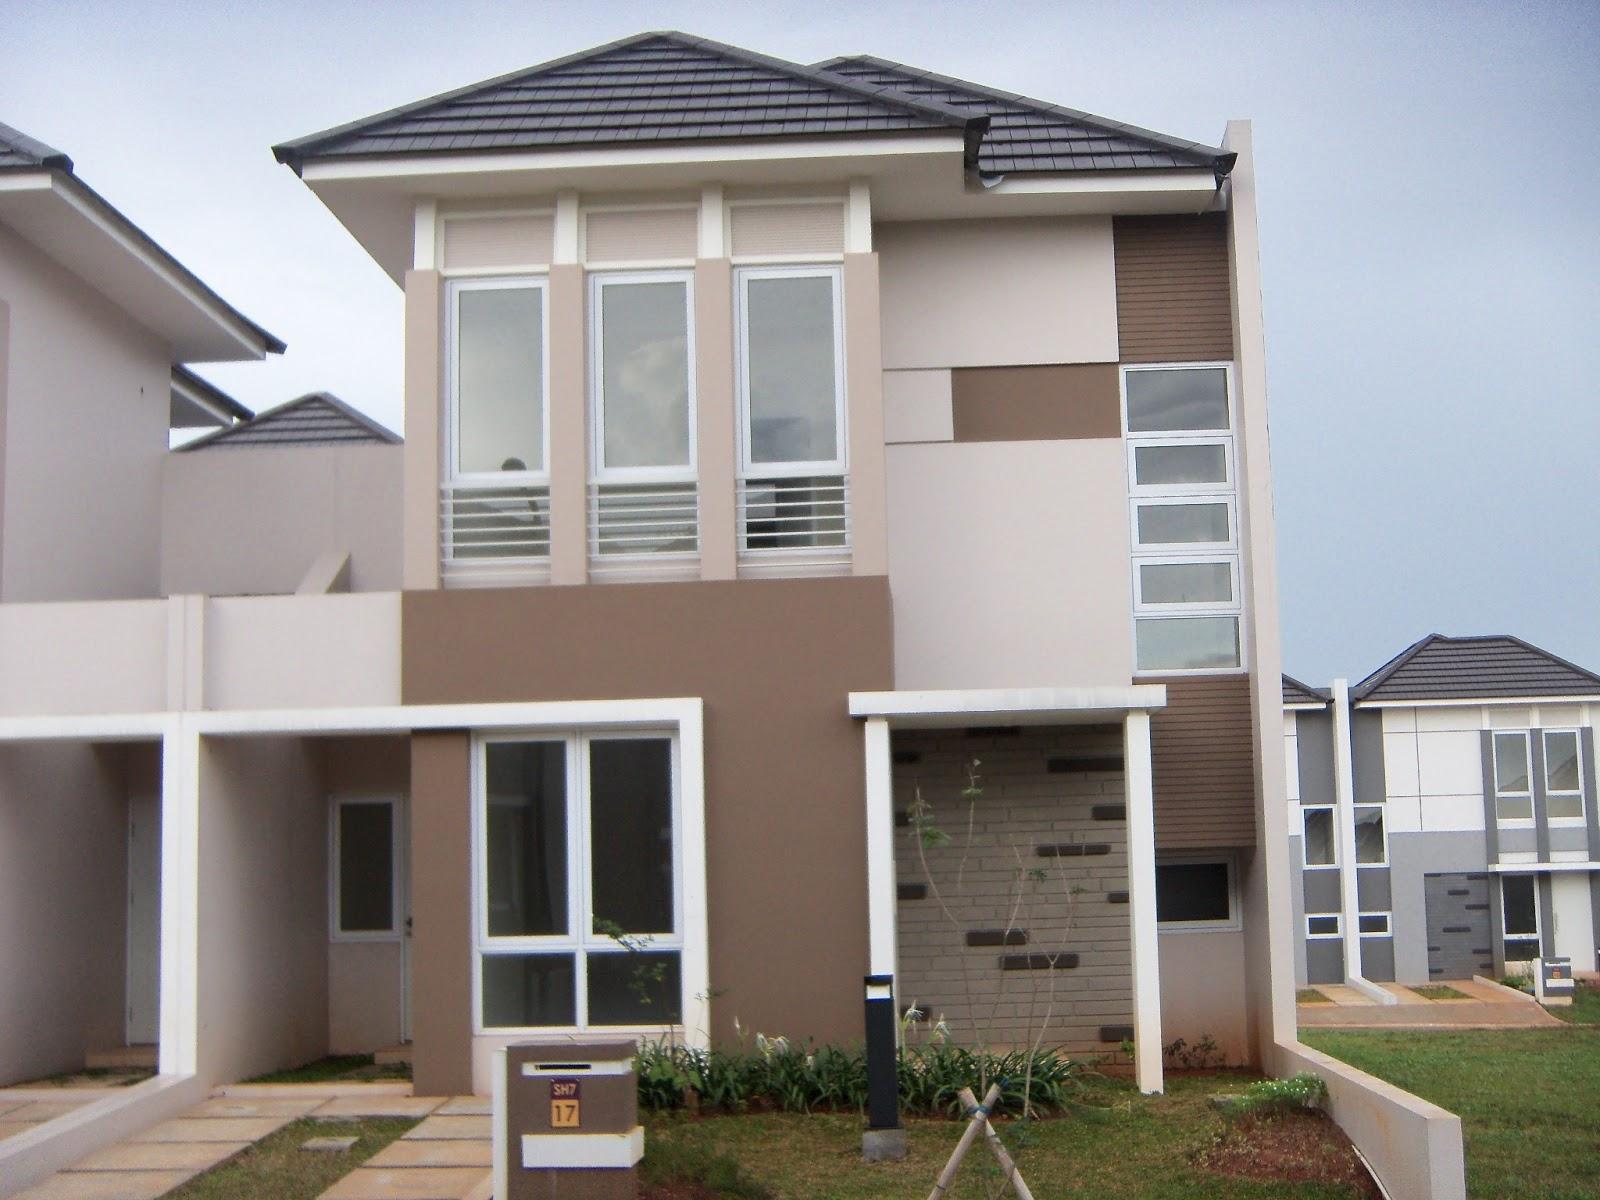 rumah minimalis membuat denah rumah minimalis 2 lantai